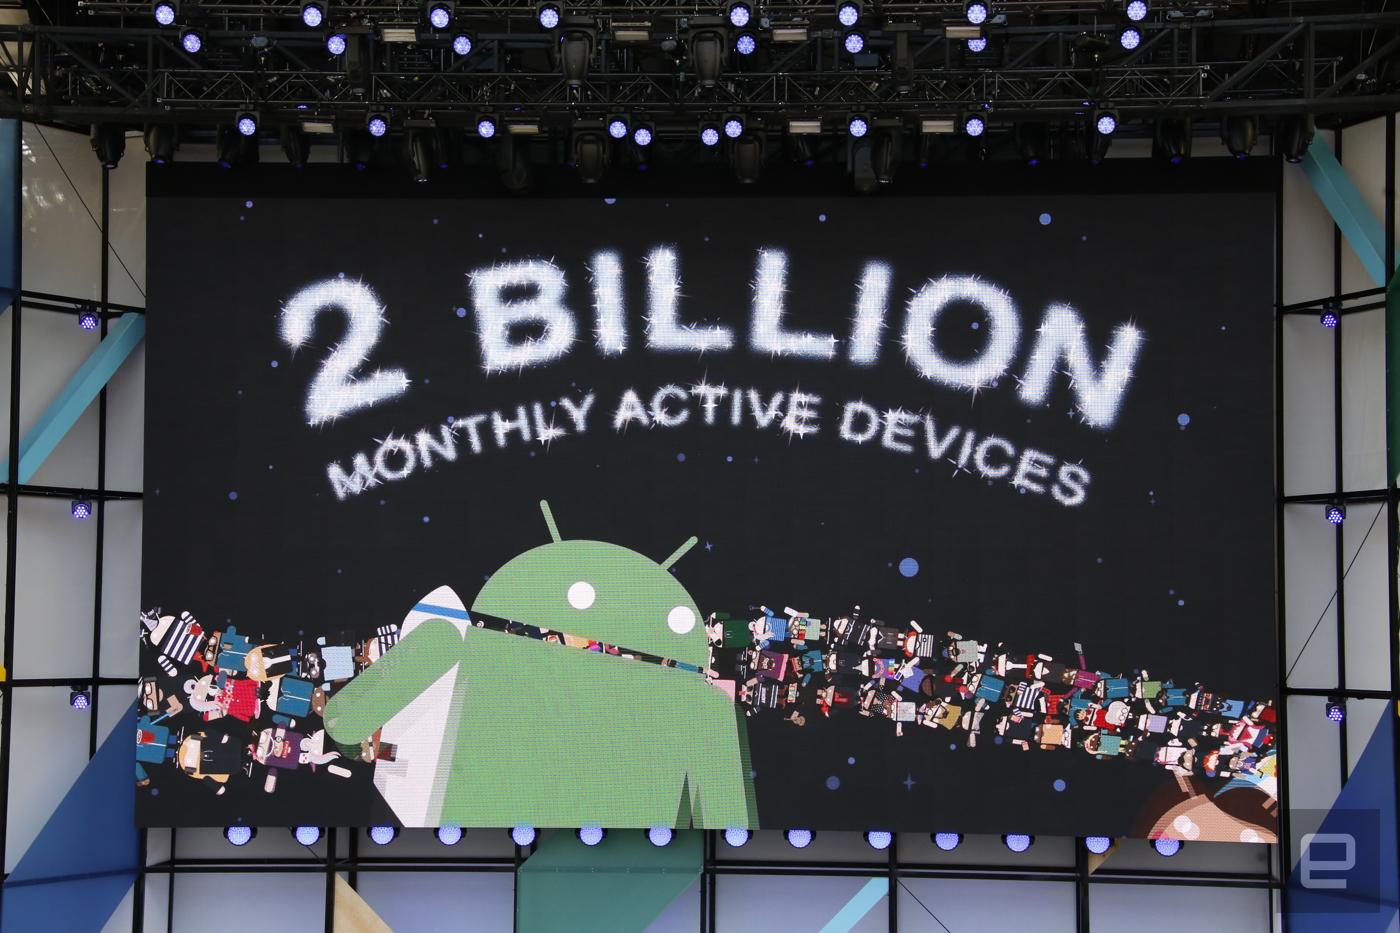 Android reaches 2 billion